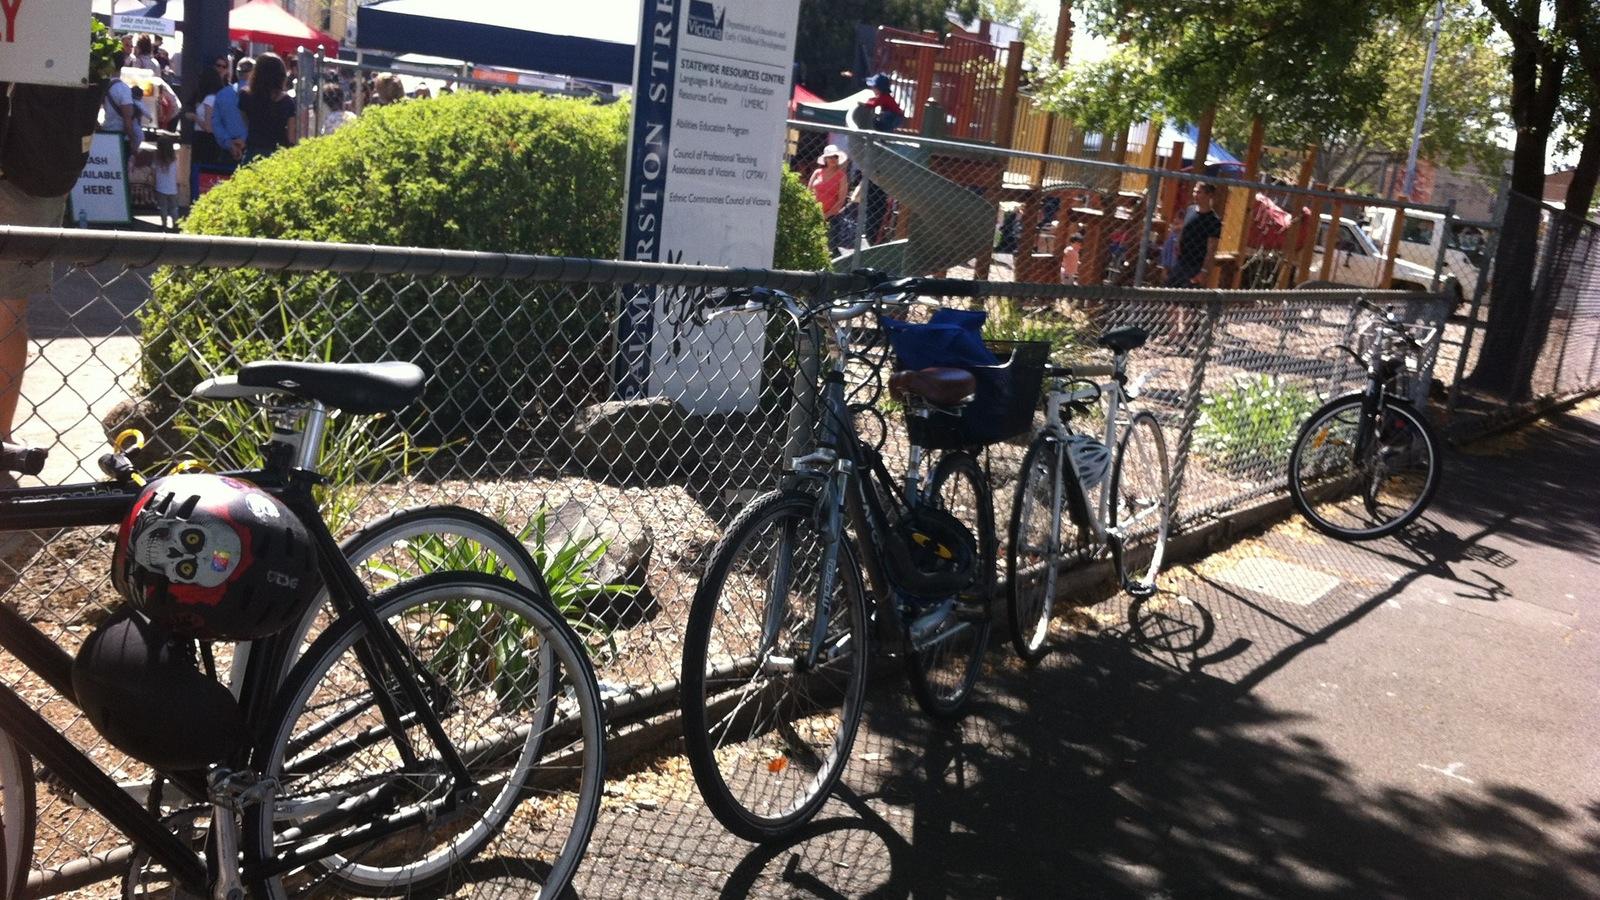 Bike parking at Carlton Farmers' Market